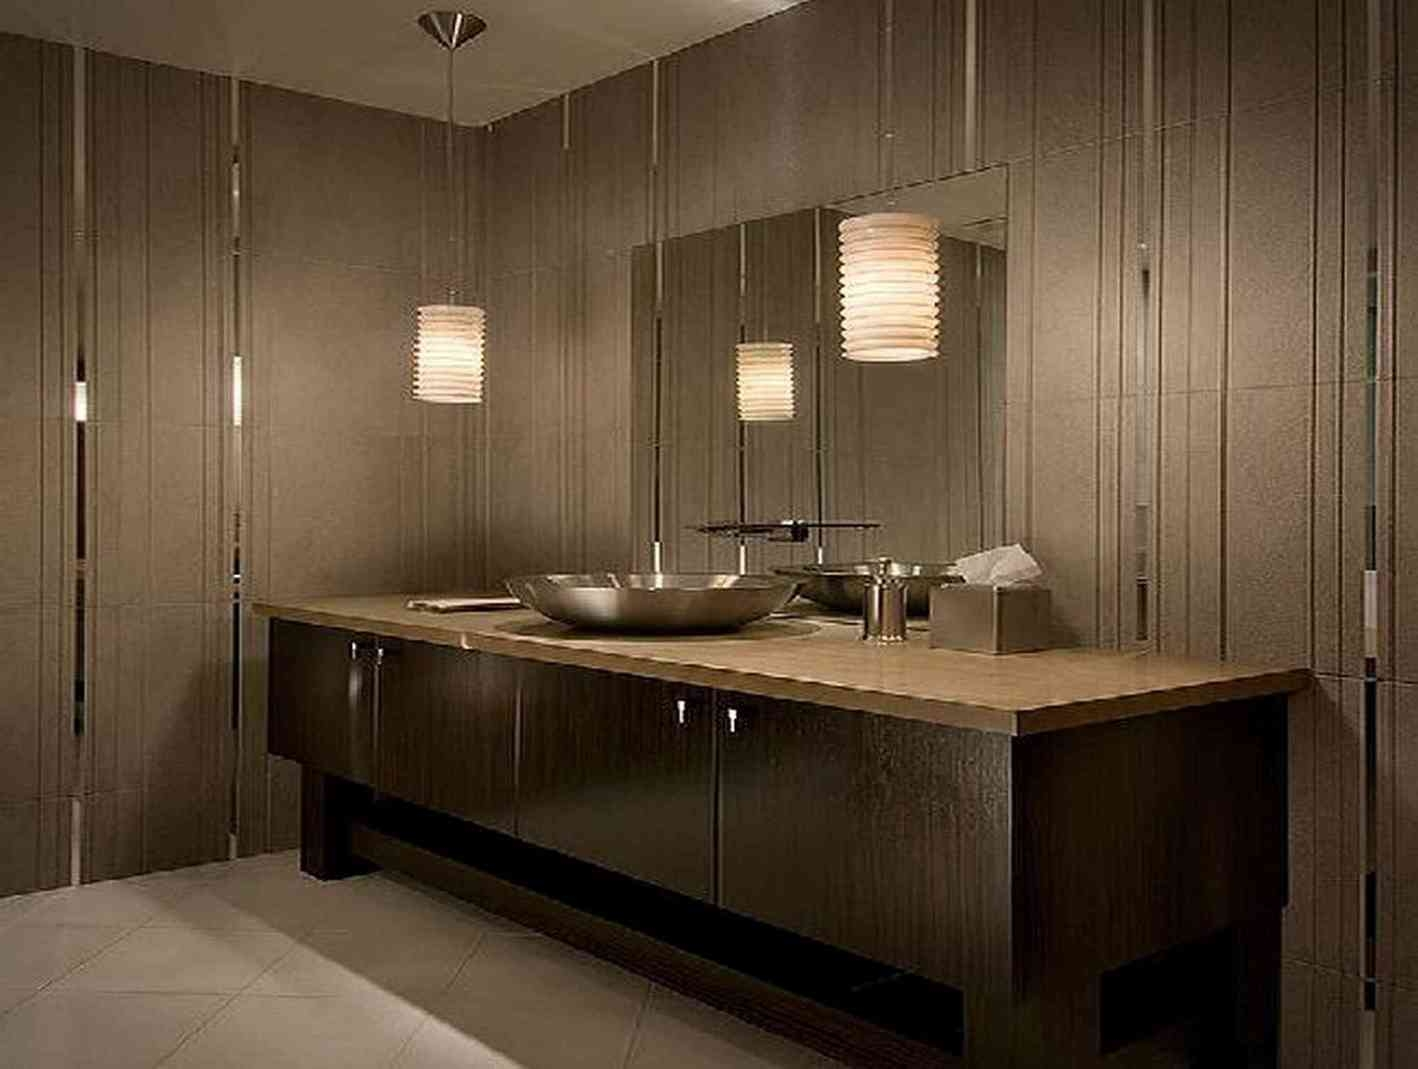 Bathroom Modern Bathroom Light Fixtures Modern Light Fixtures Regarding Bathroom Lighting Chandeliers (Image 12 of 25)